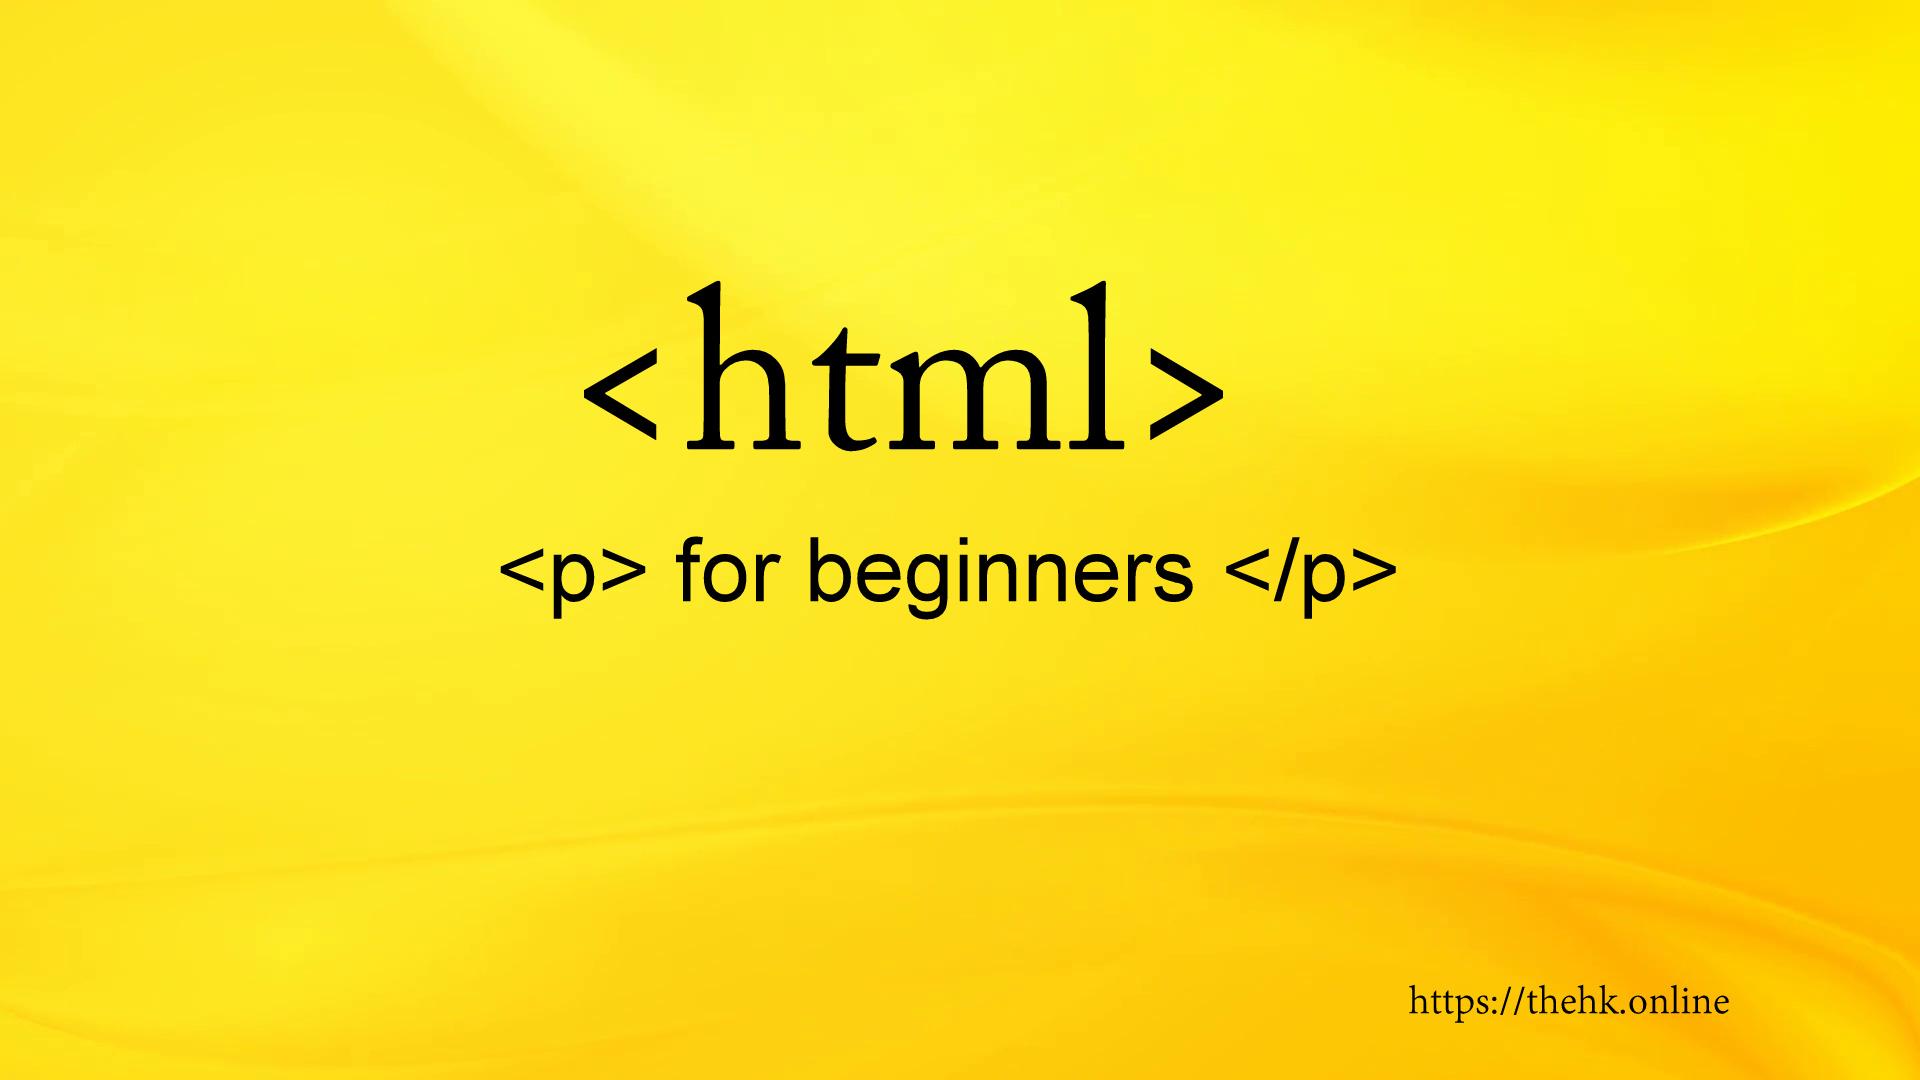 Html tutorial for beginners step by step procedure the hk online baditri Gallery